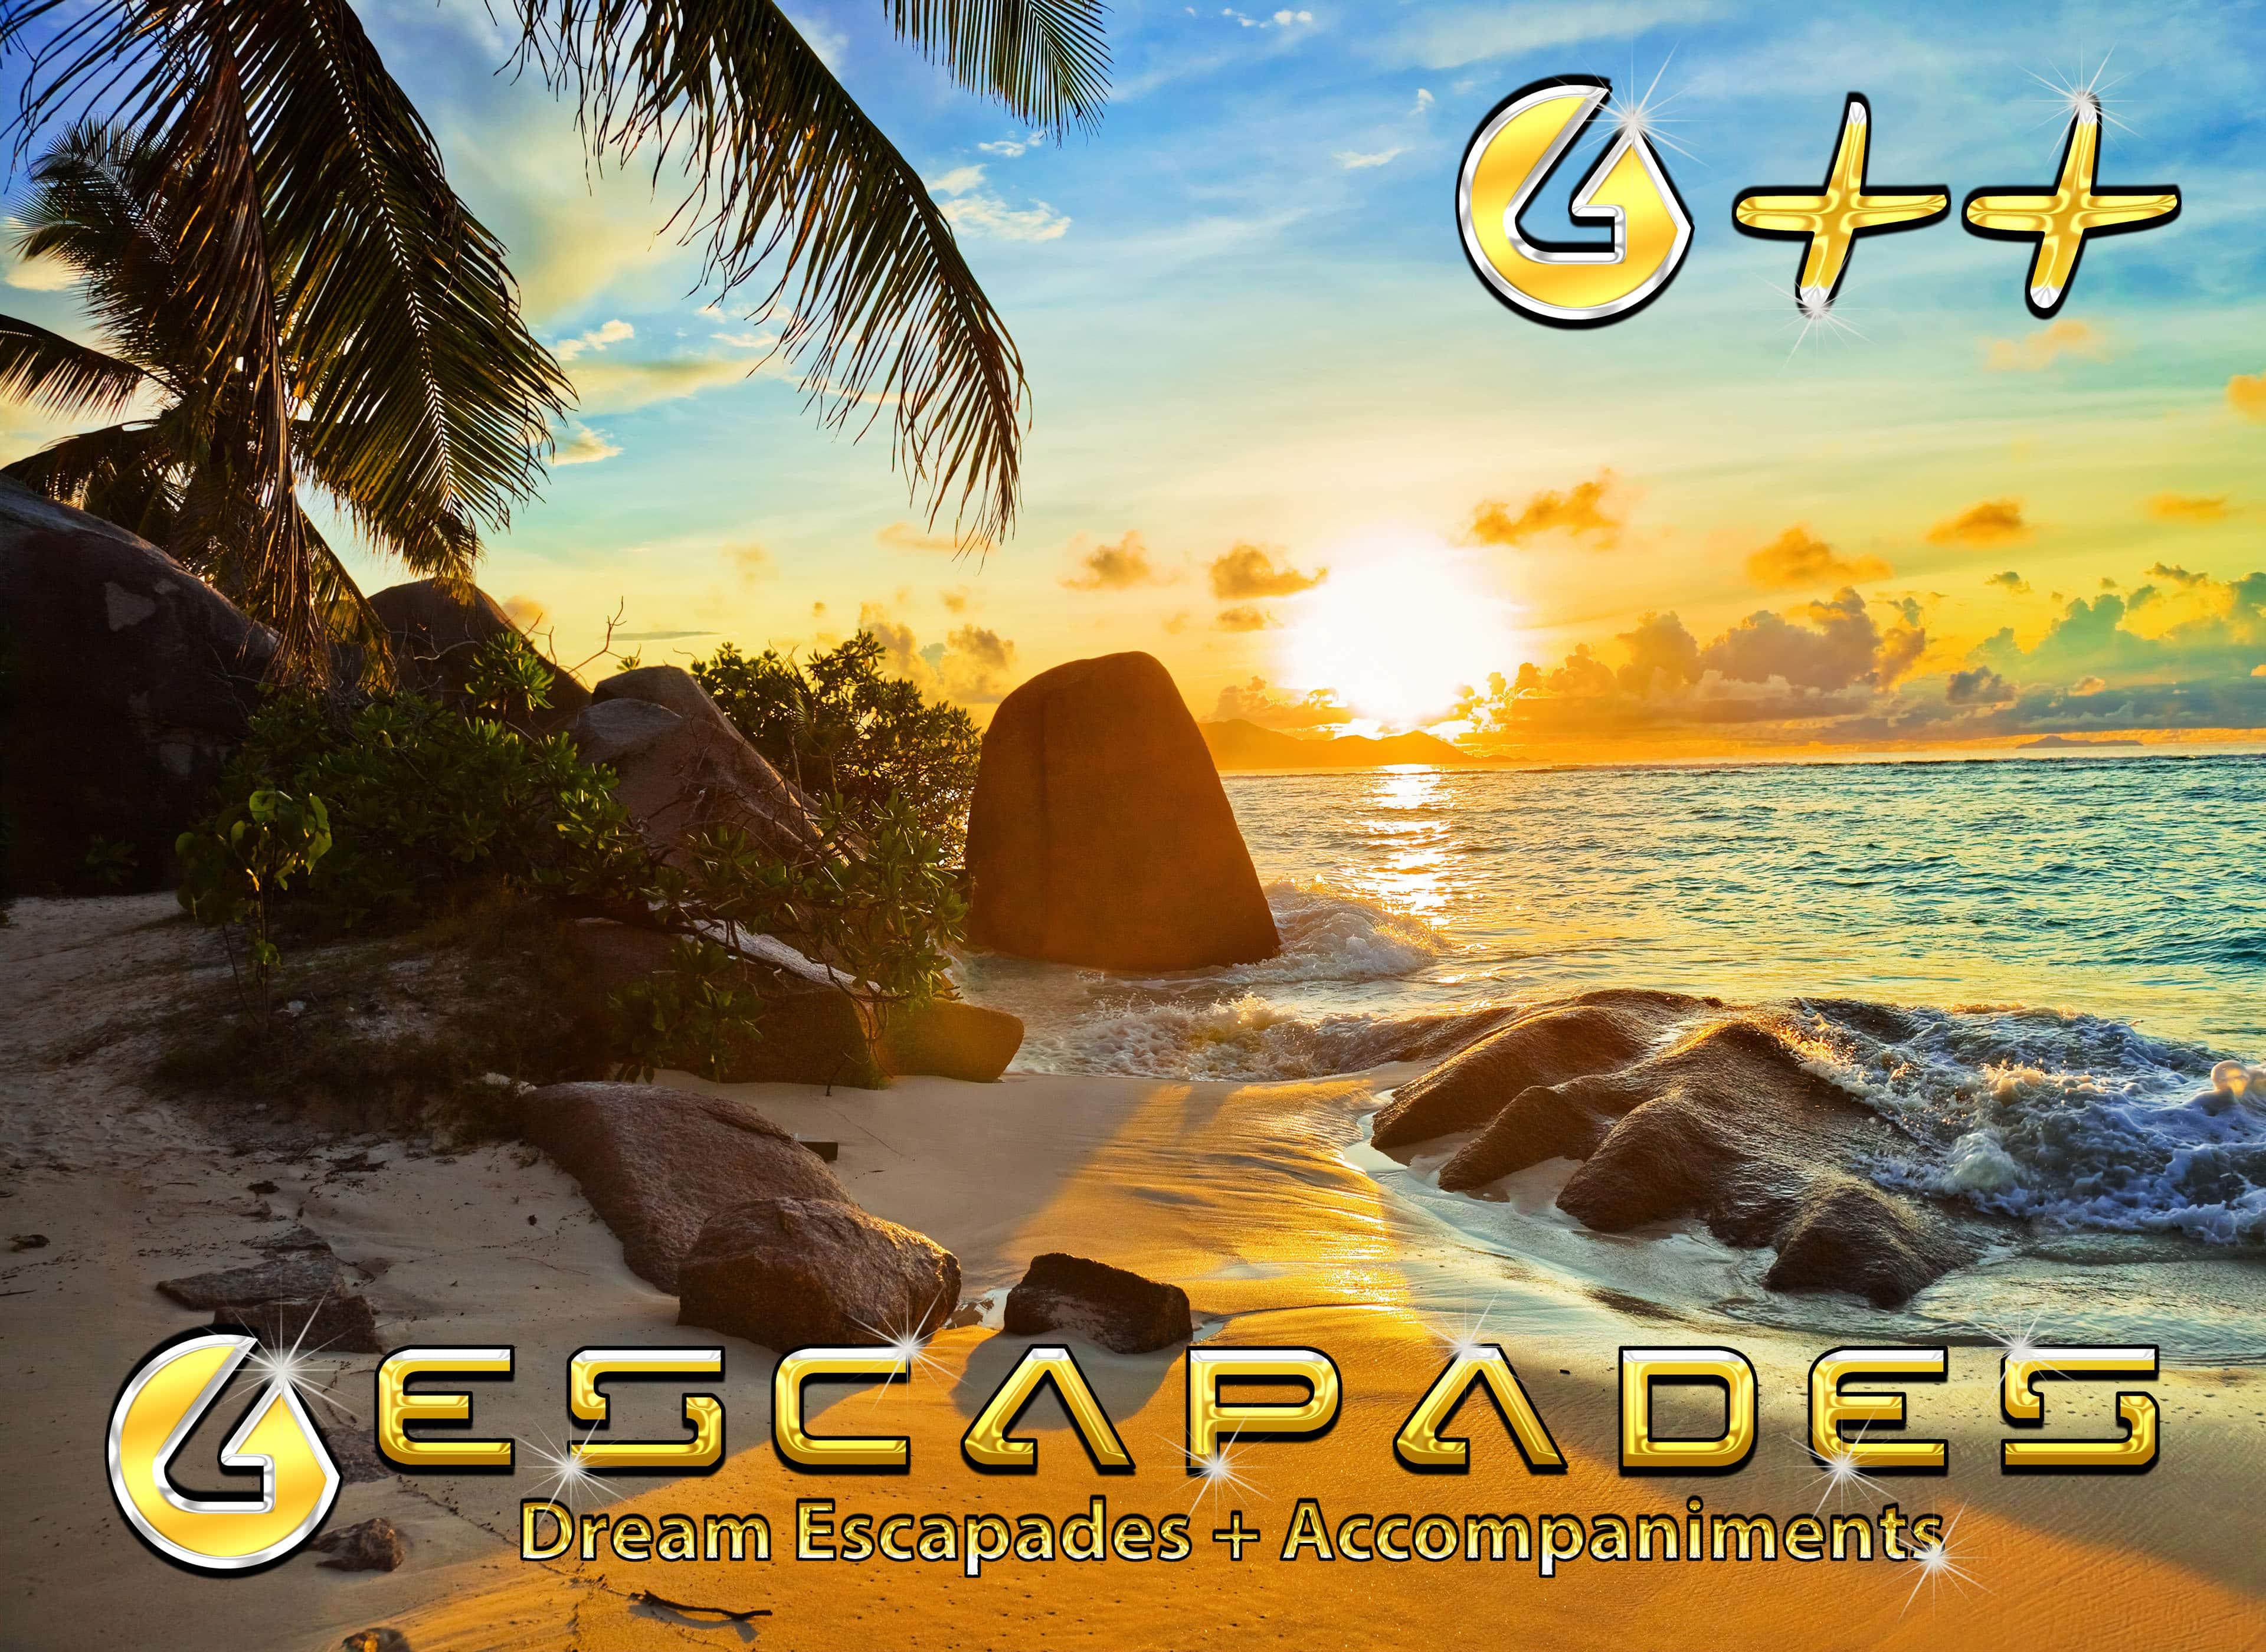 Absolu-Escapades-Absolu++-Dream-Escapades-And-Accompaniments-EN-4K